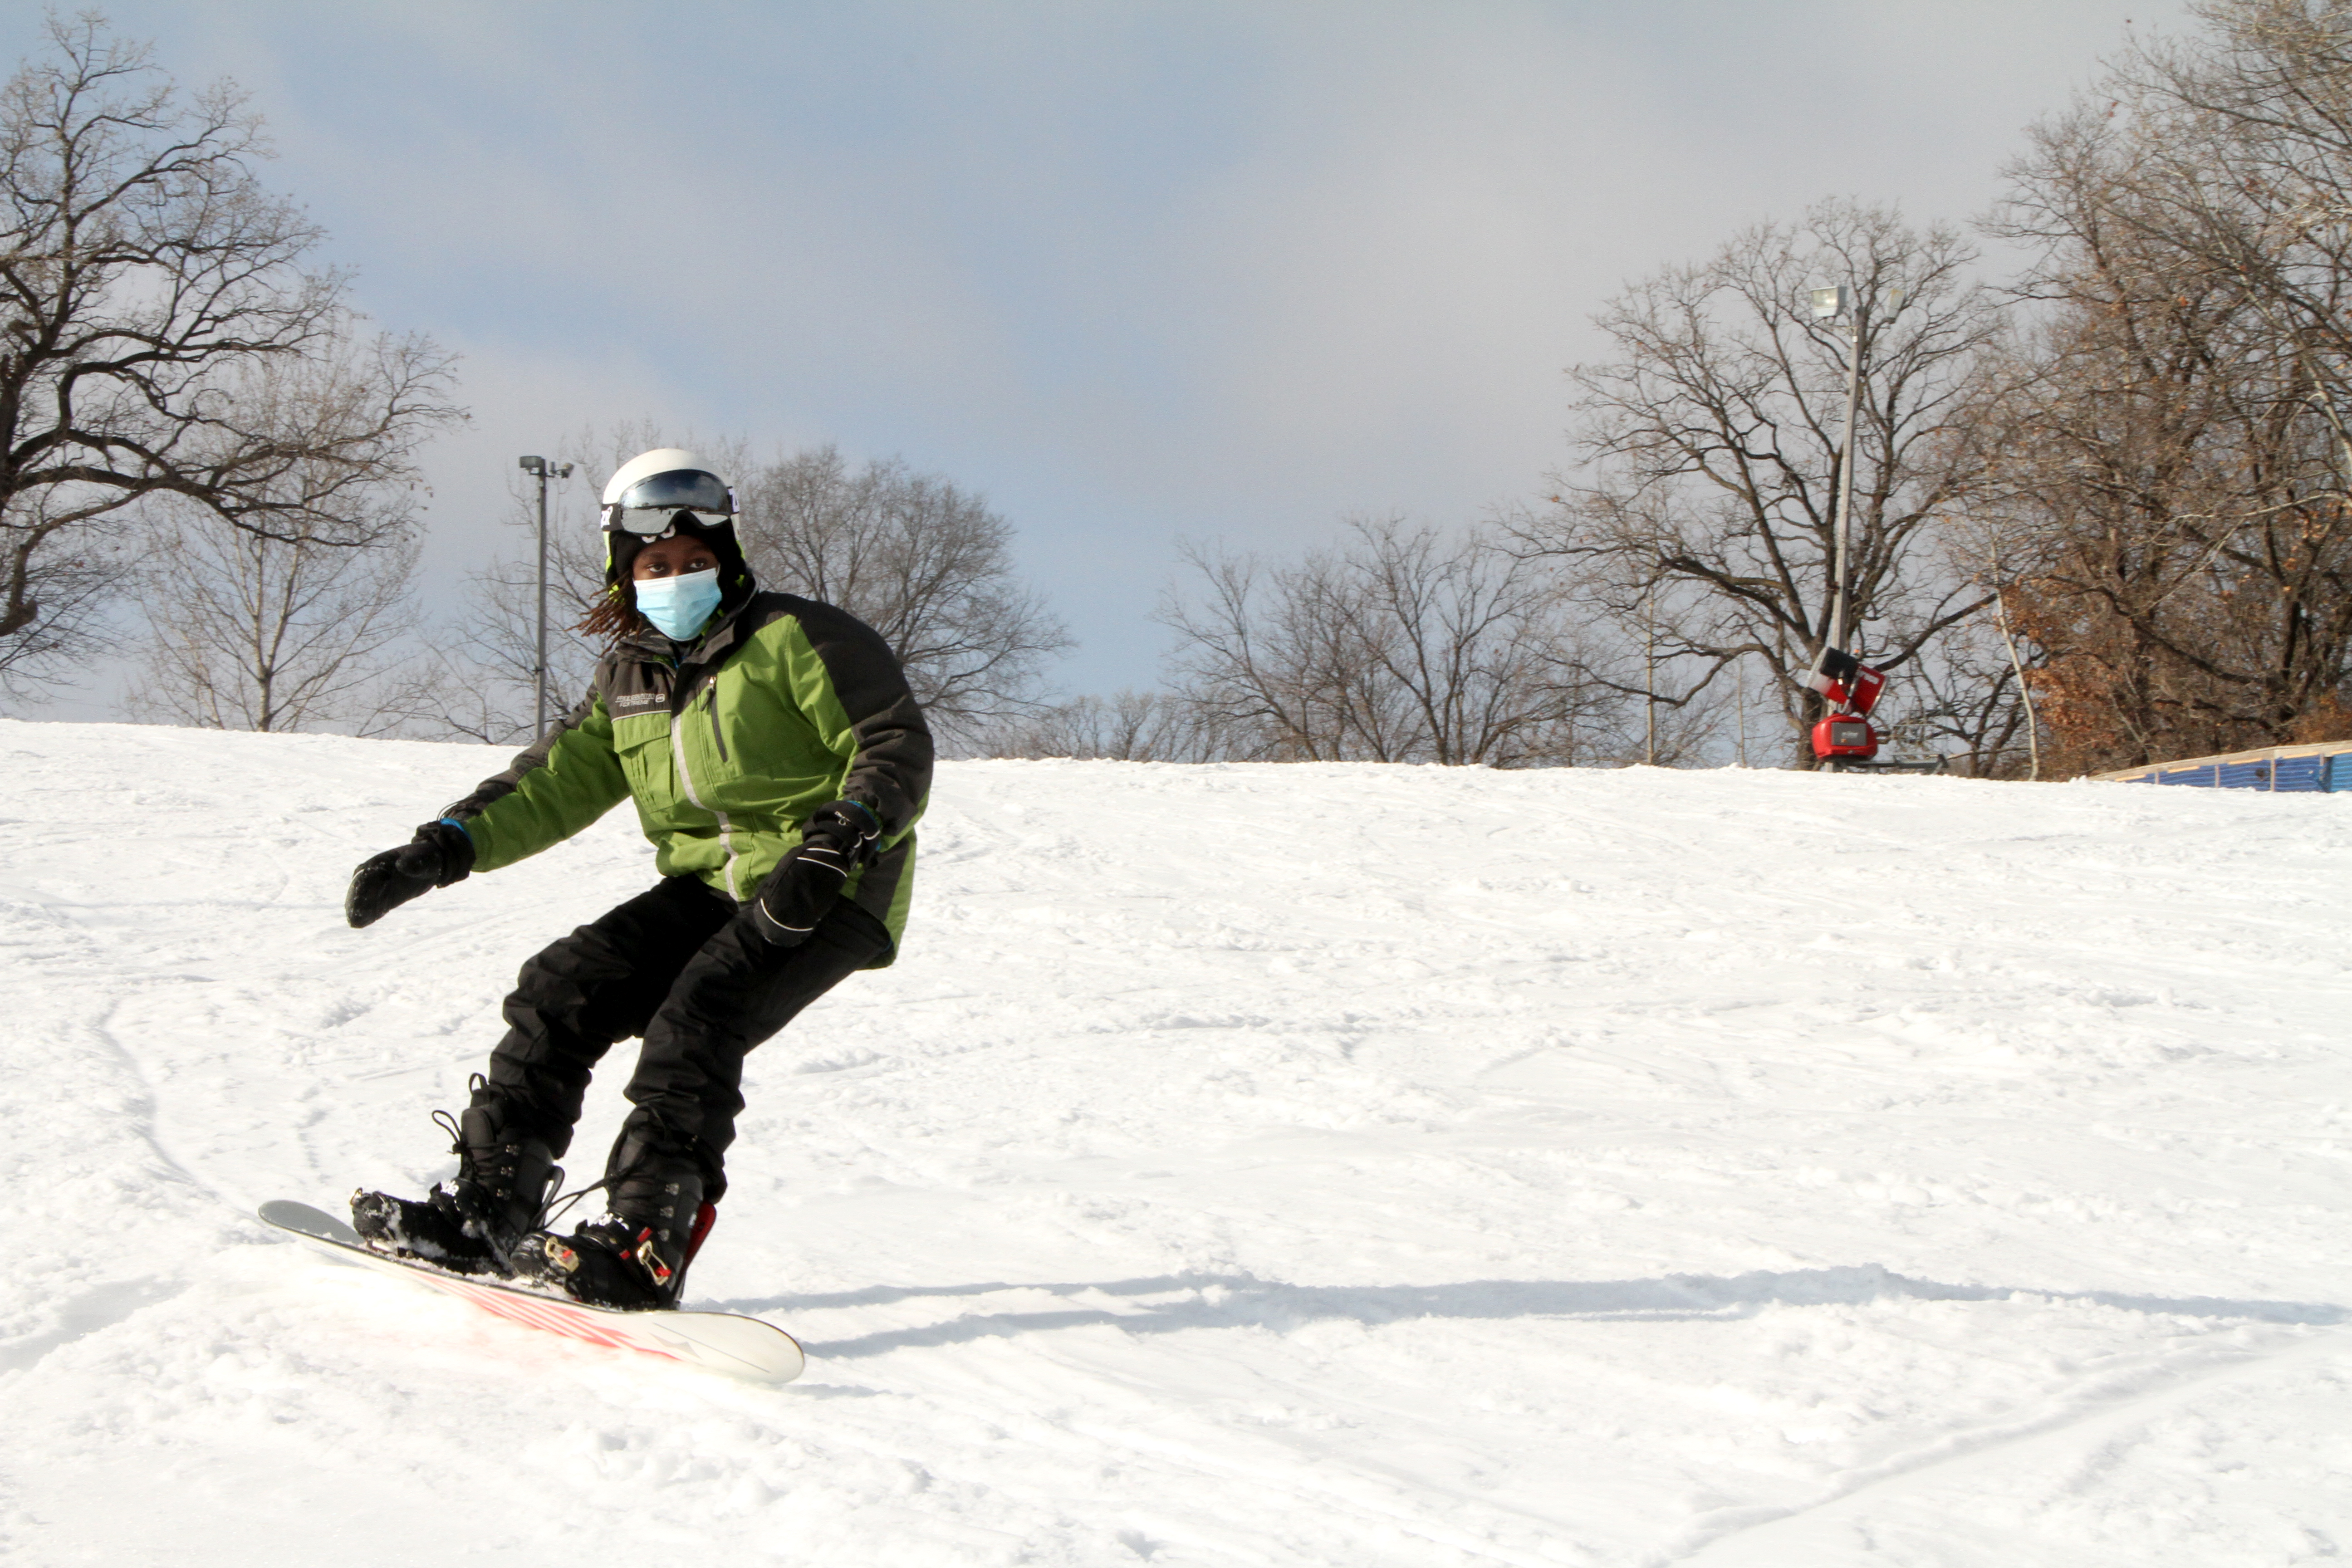 Snowboarding in Minnesota